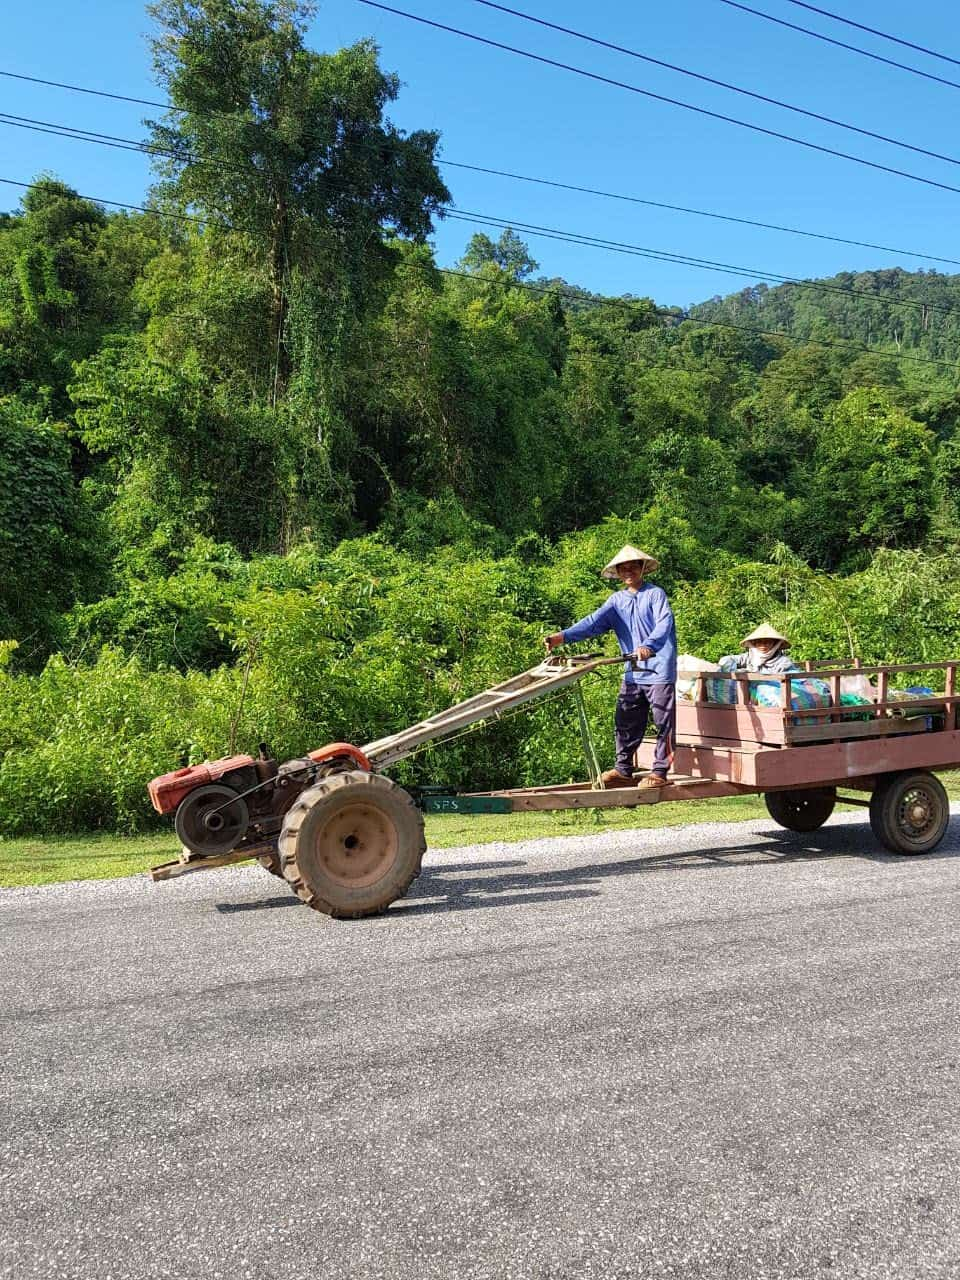 Laos, la boucle de Thakhek à moto 🛵 14